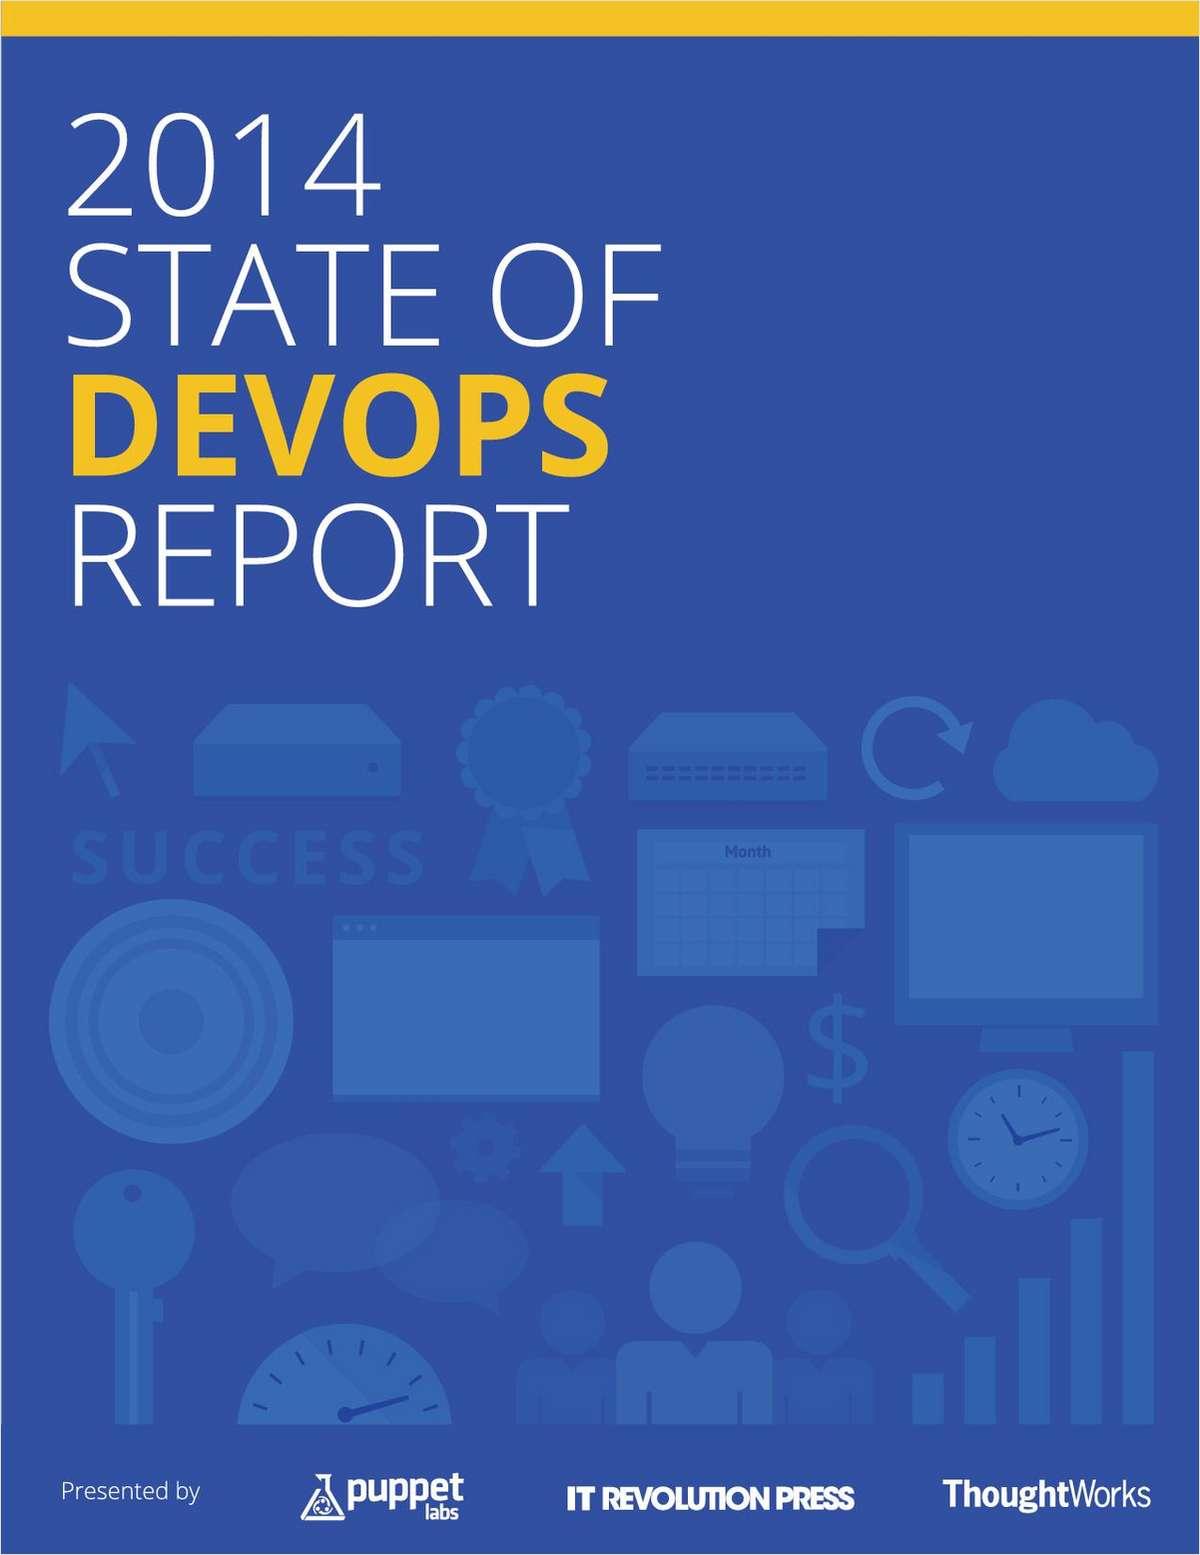 2014 State of DevOps Report